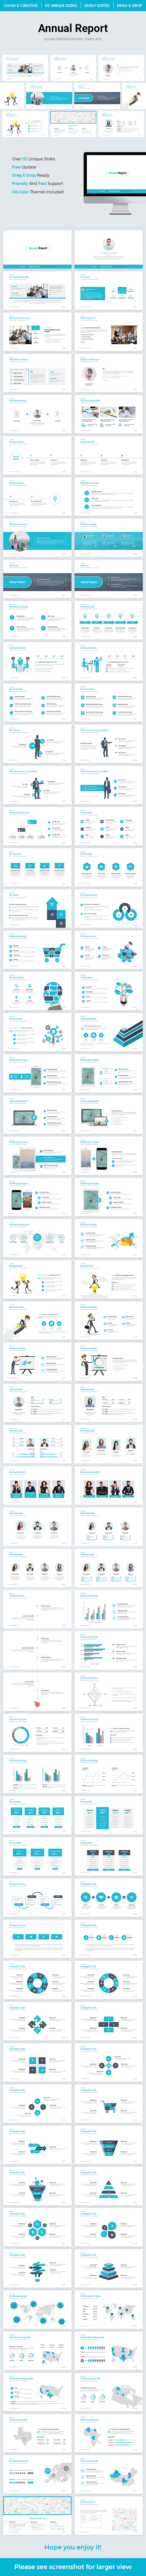 Annual Report Google Slide Template 2.0 - Google Slides Presentation Templates